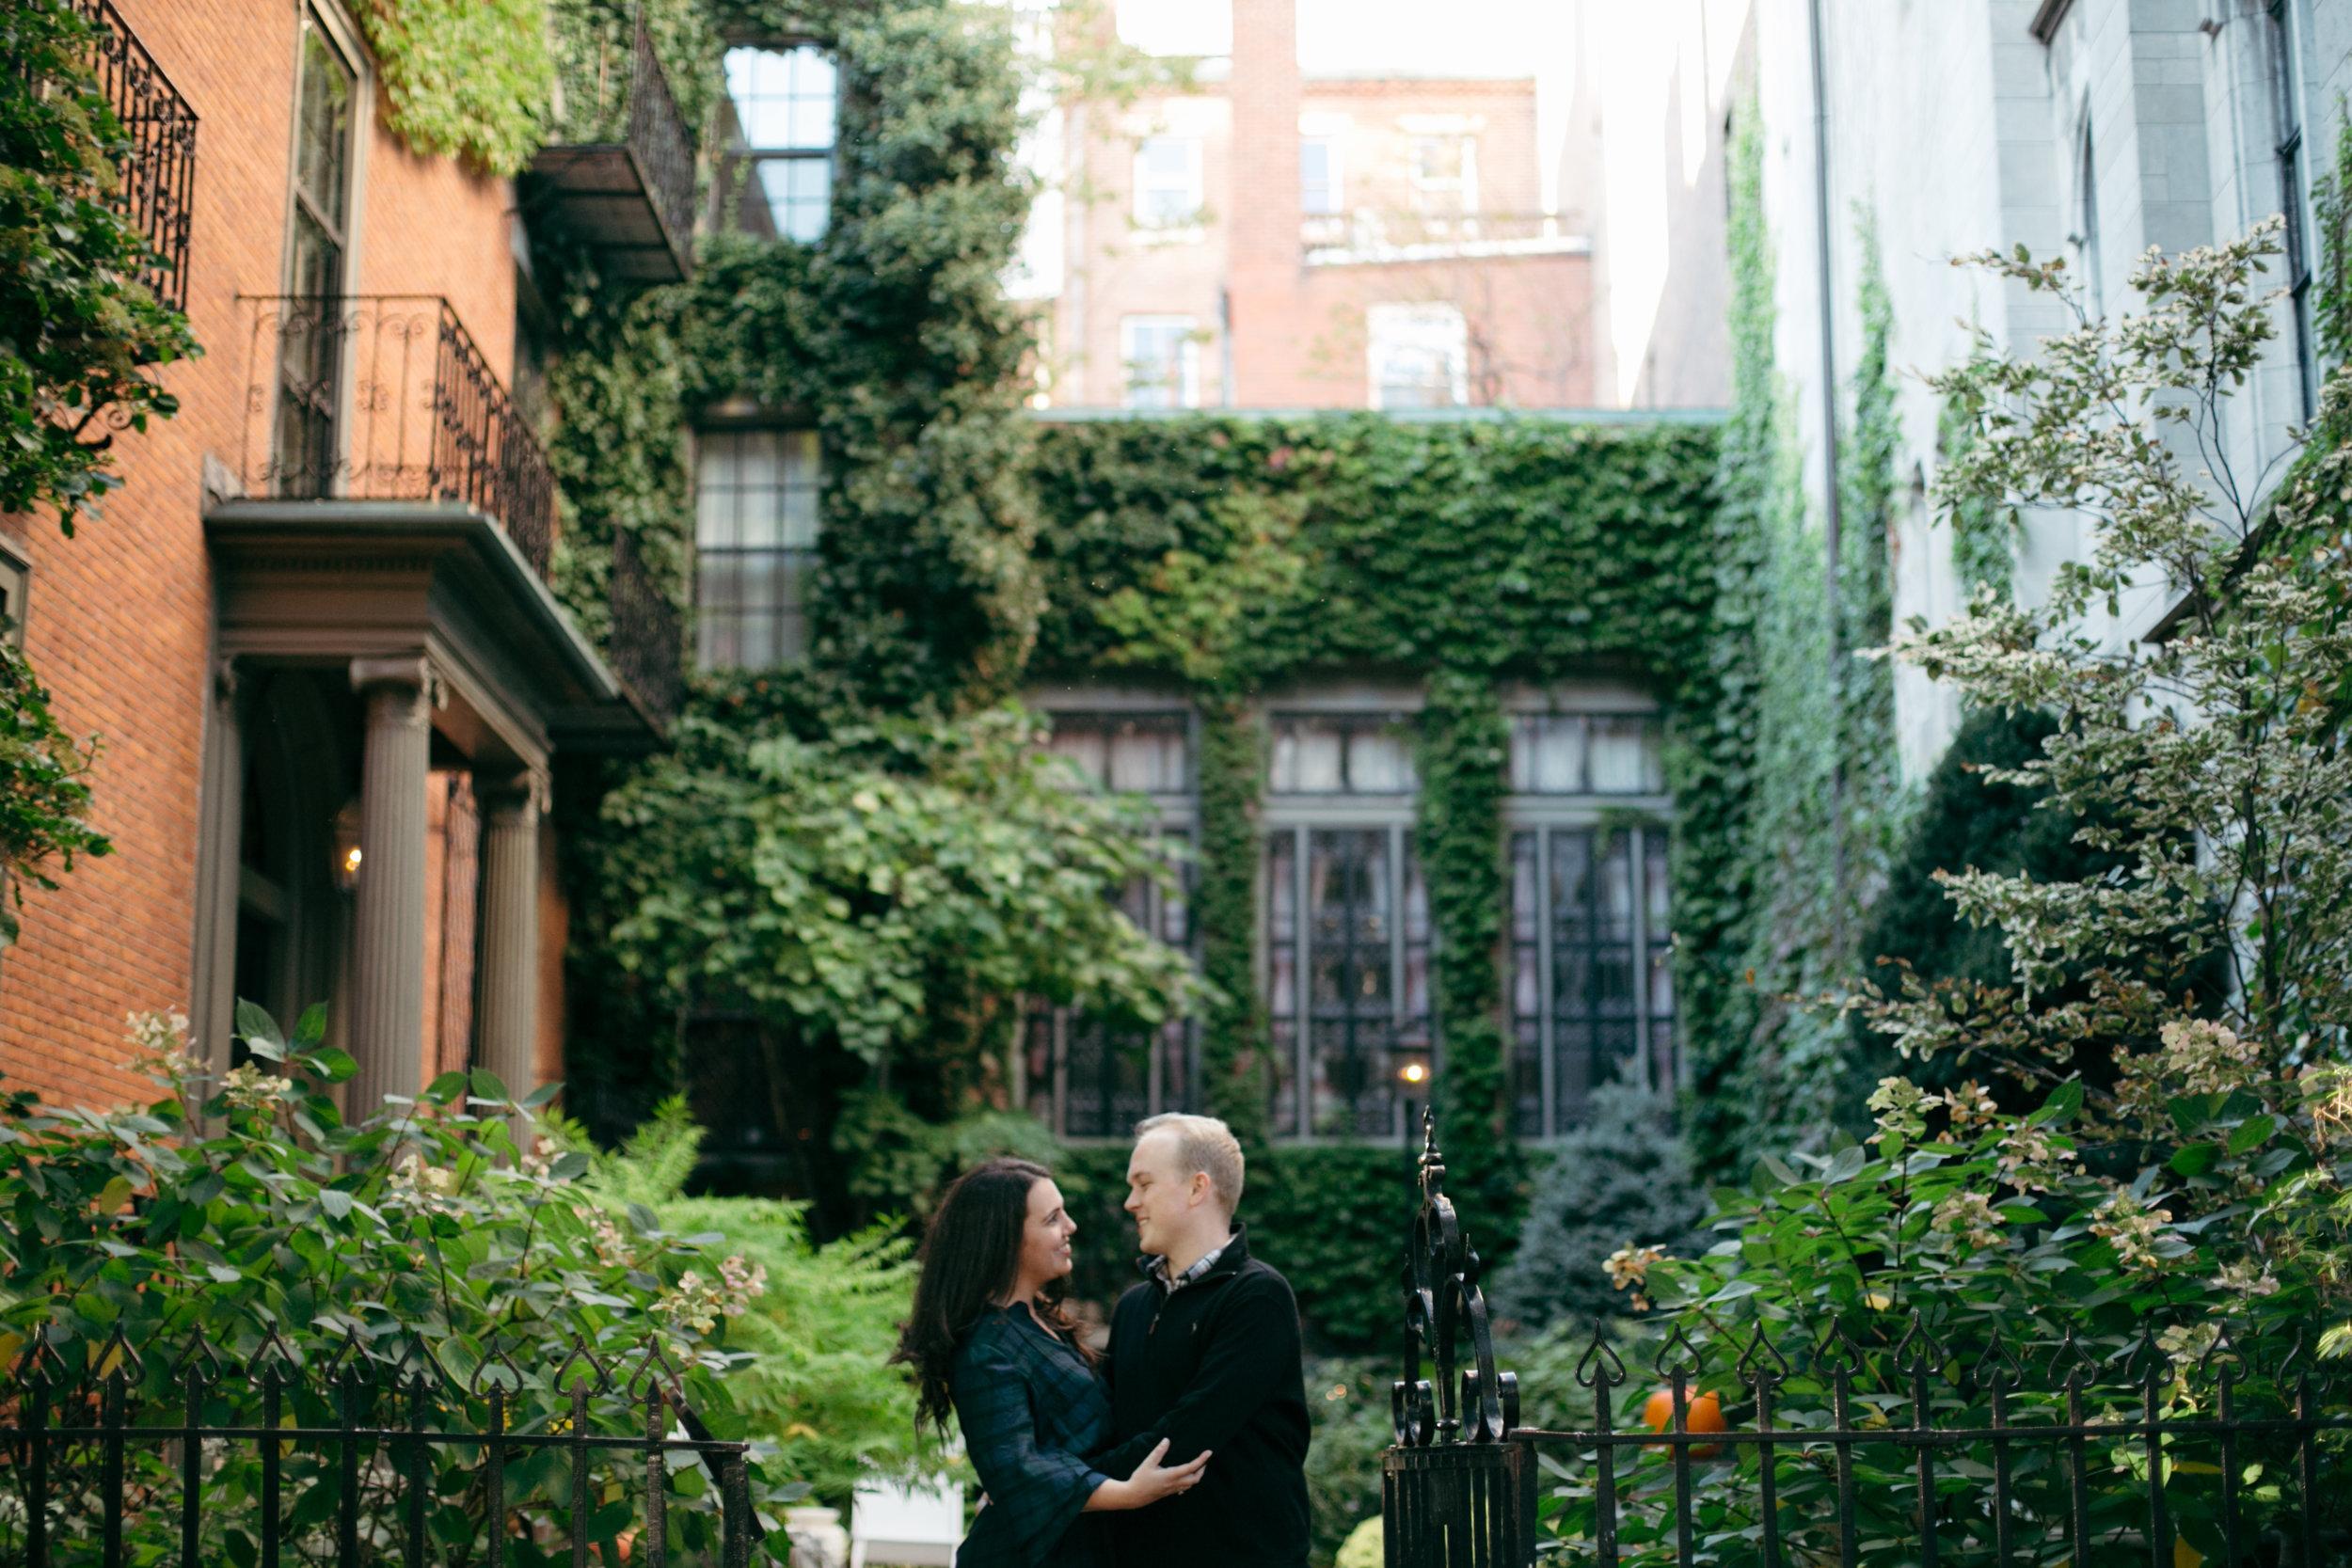 Bailey-Q-Photo-Boston-Engagement-Public-Gardens-Beacon-Hill-028.JPG